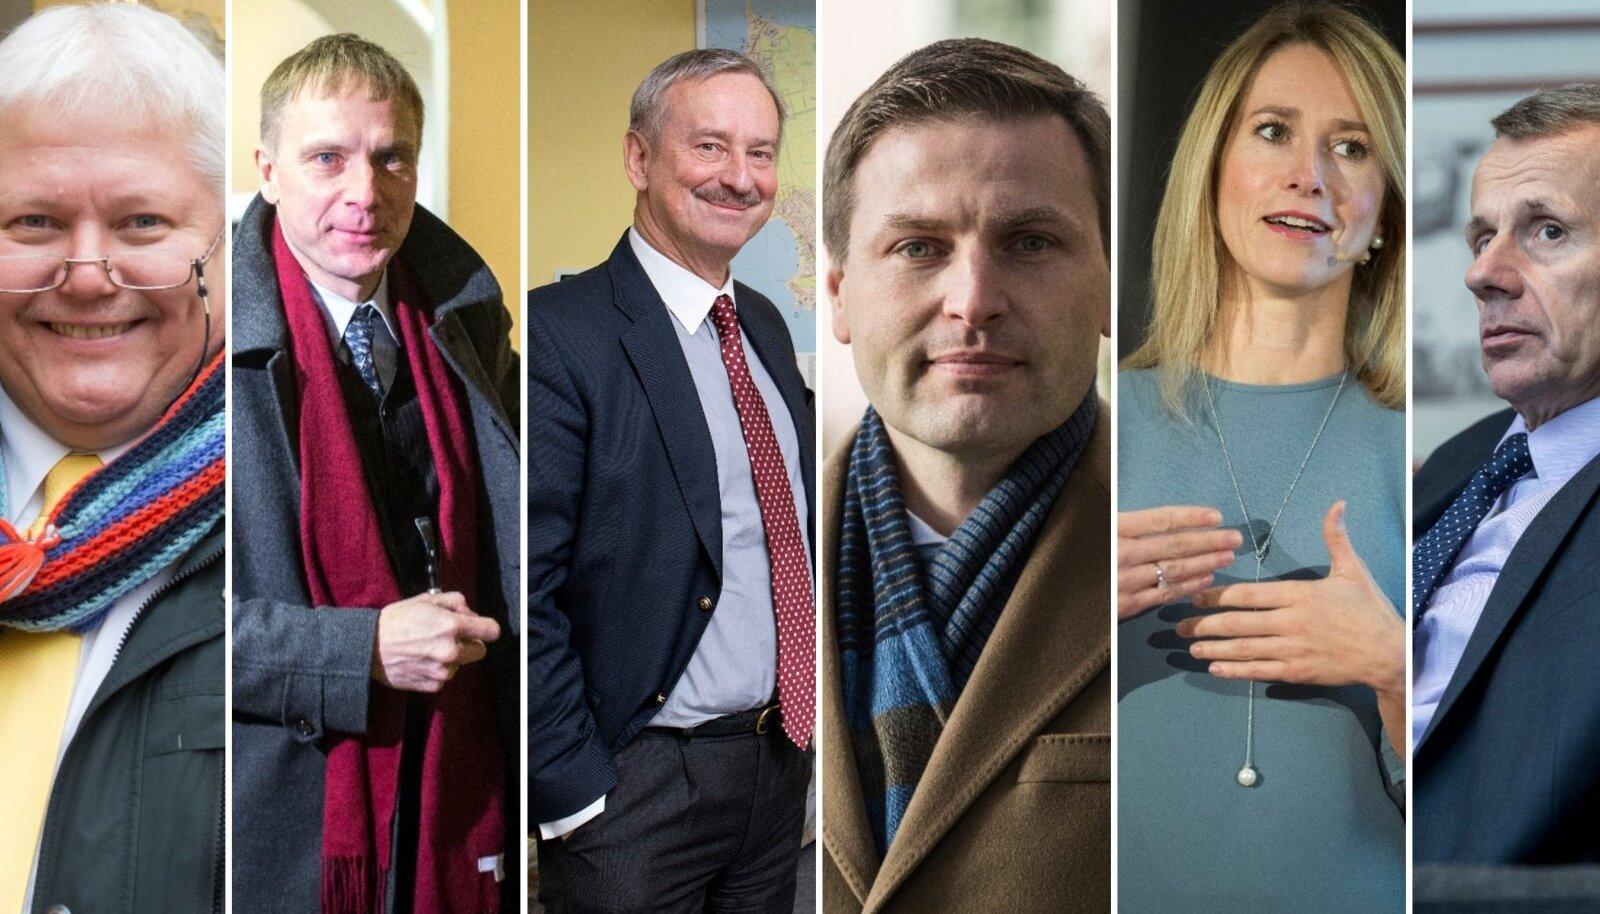 Rein Lang, Eerik-Niiles Kross, Siim Kallas, Hanno Pevkur, Kaja Kallas ja Jürgen Ligi